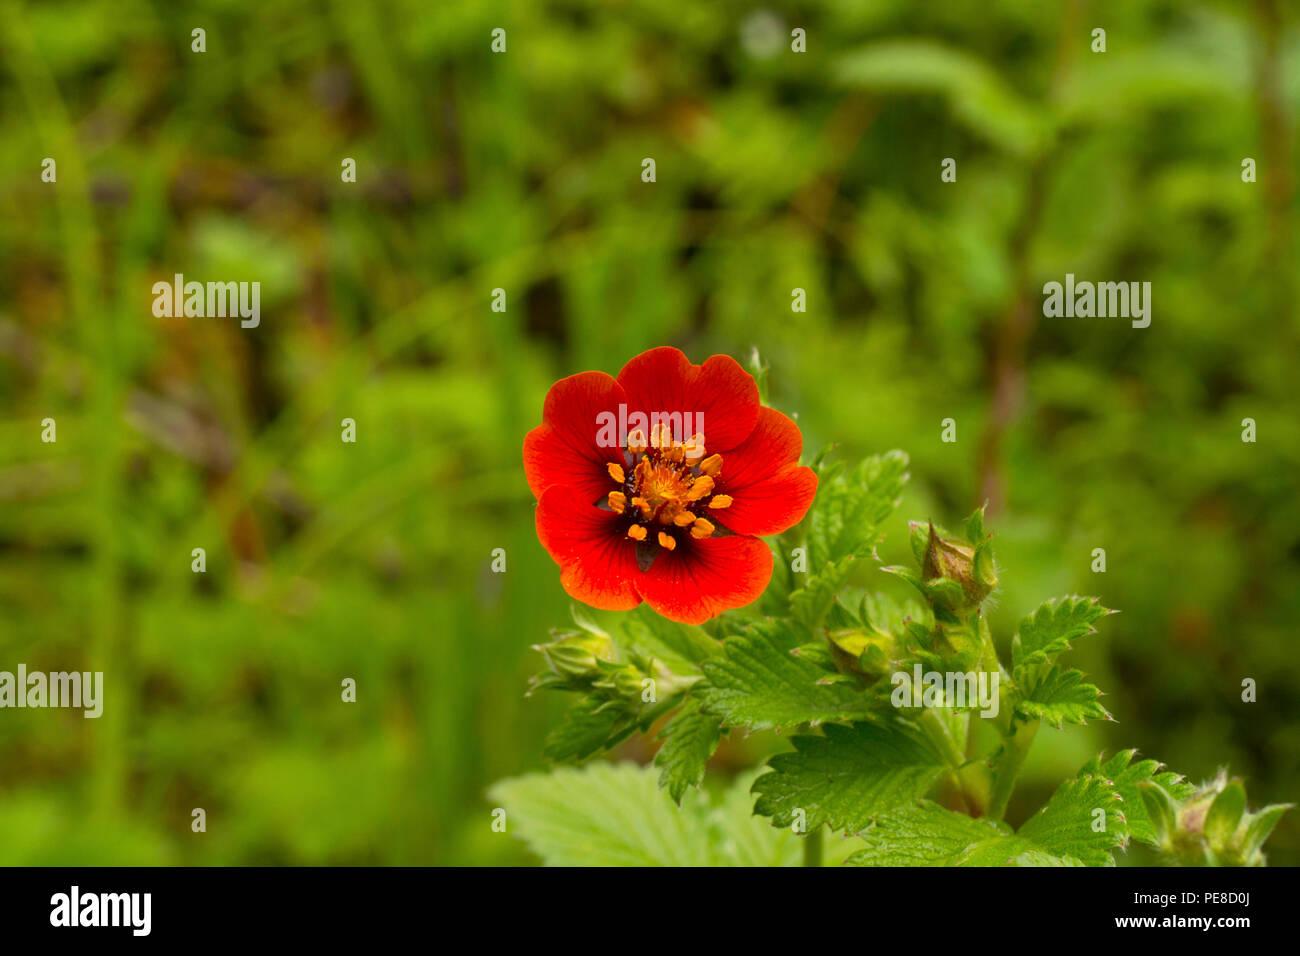 Himalayan Cinquefoil, Potentilla argyrophylla var. atrosanguinea, Hemkund Sahib, Uttarakhand, India - Stock Image